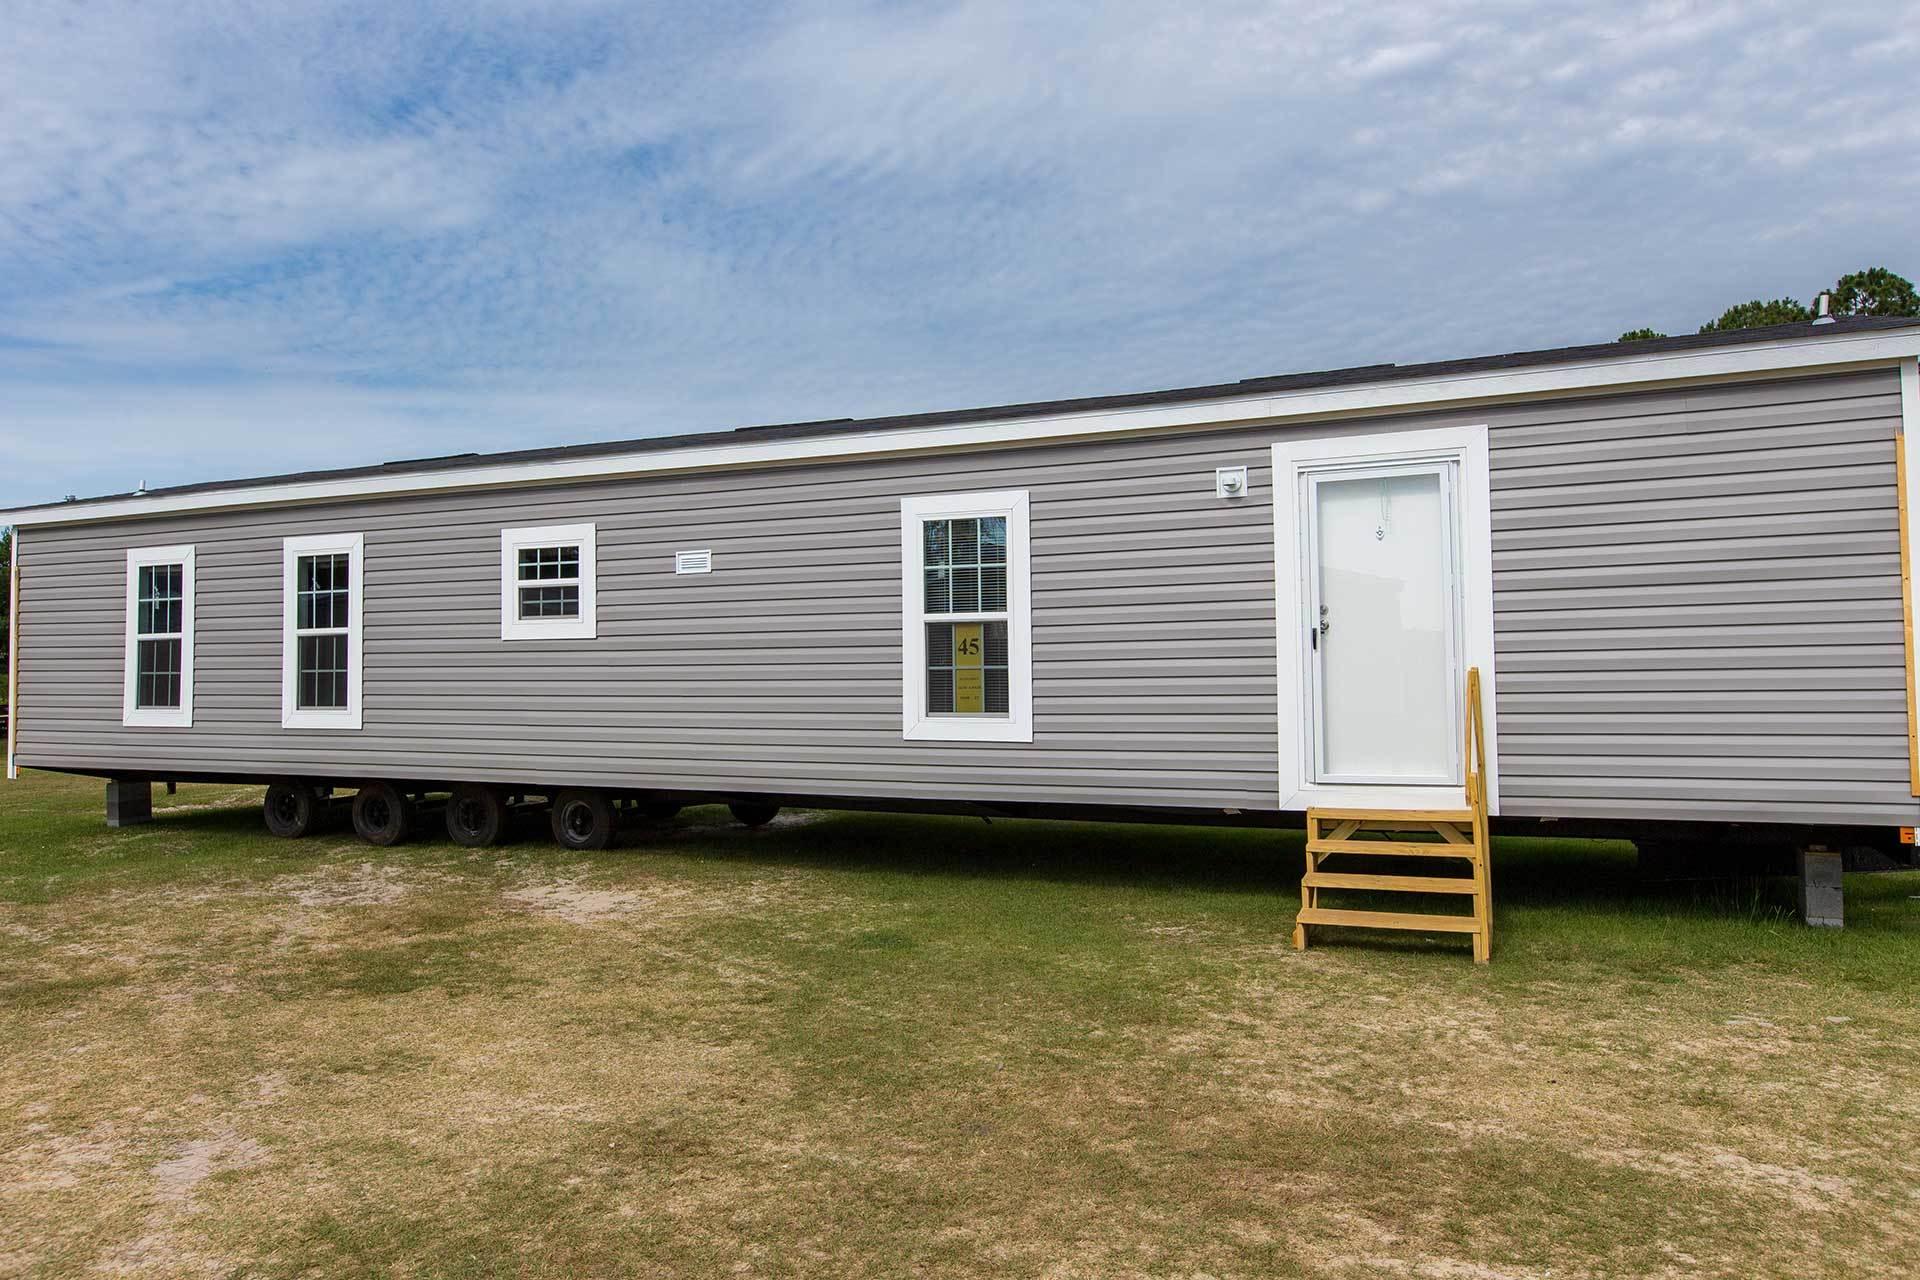 prefabricated home for sale - Pensacola, FL